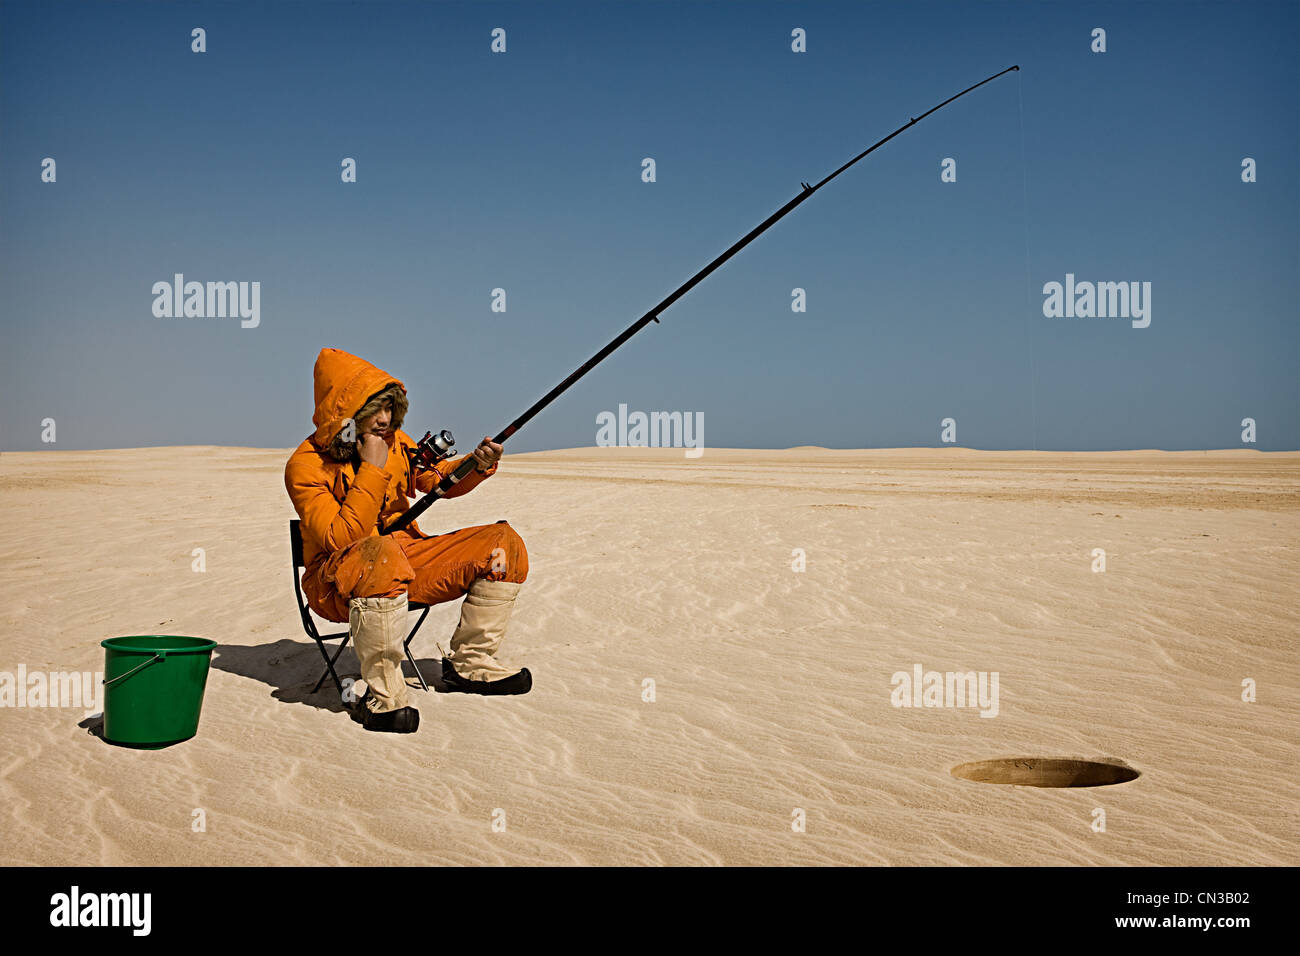 Eskimo fishing in desert Stock Photo